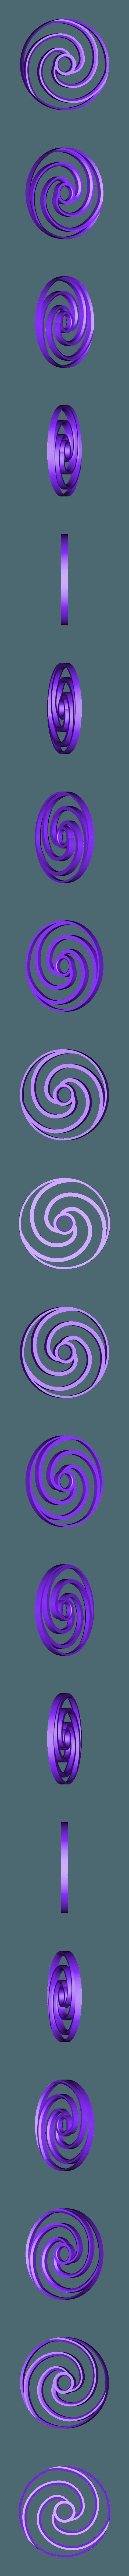 disque_sup__3_.stl Download free STL file Spiral optic illusion 2 • 3D printing design, NOP21